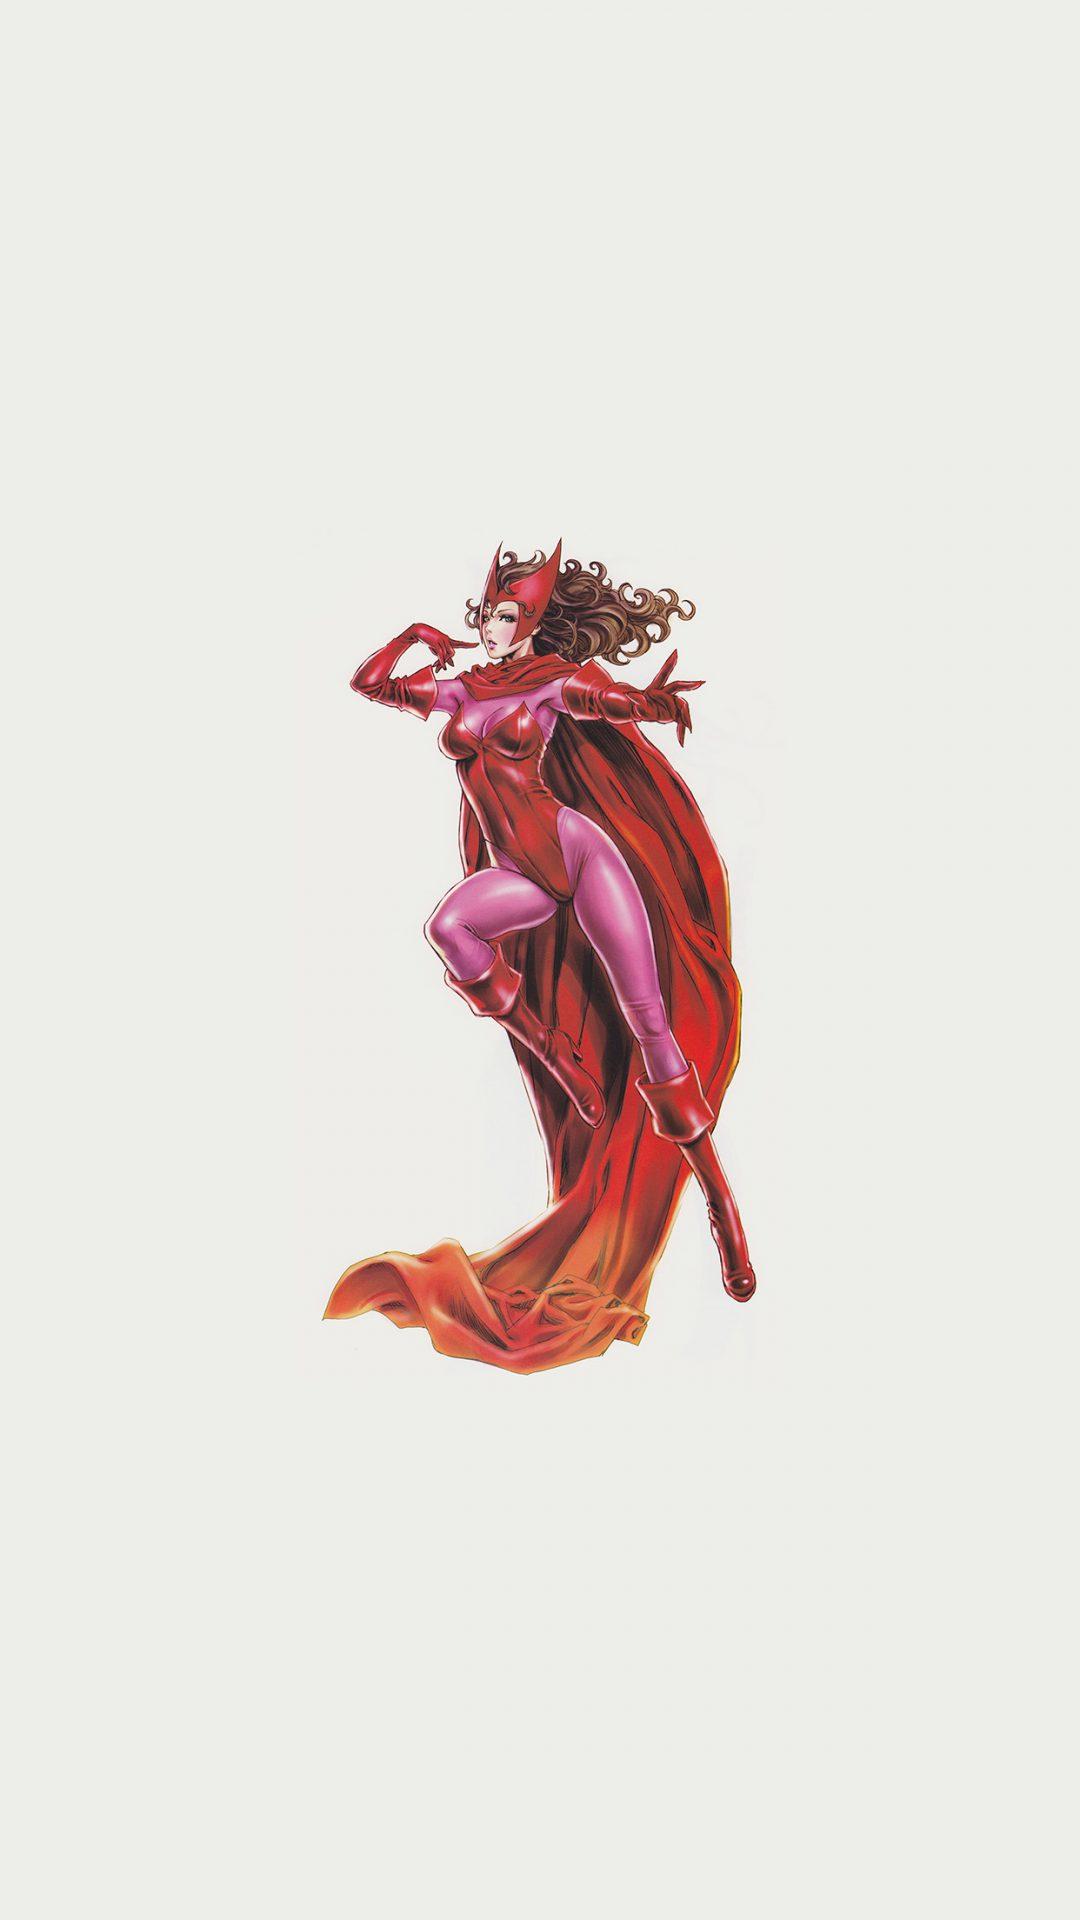 Scarlet Witch Avengers Comics Illust Art Film